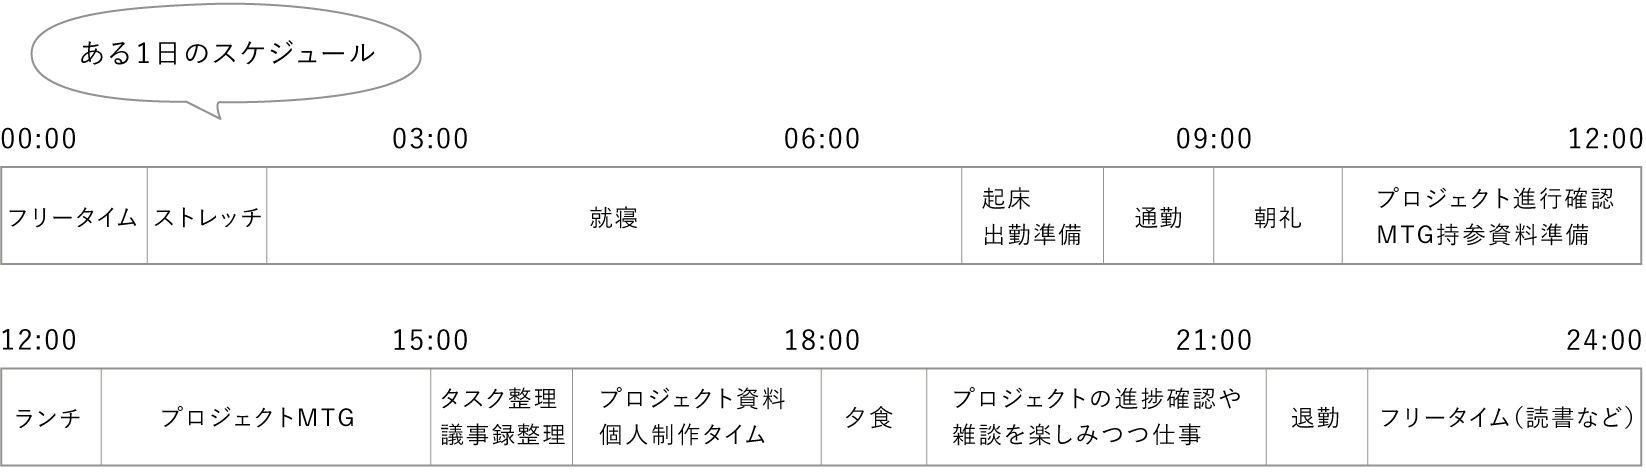 schedule02_yano